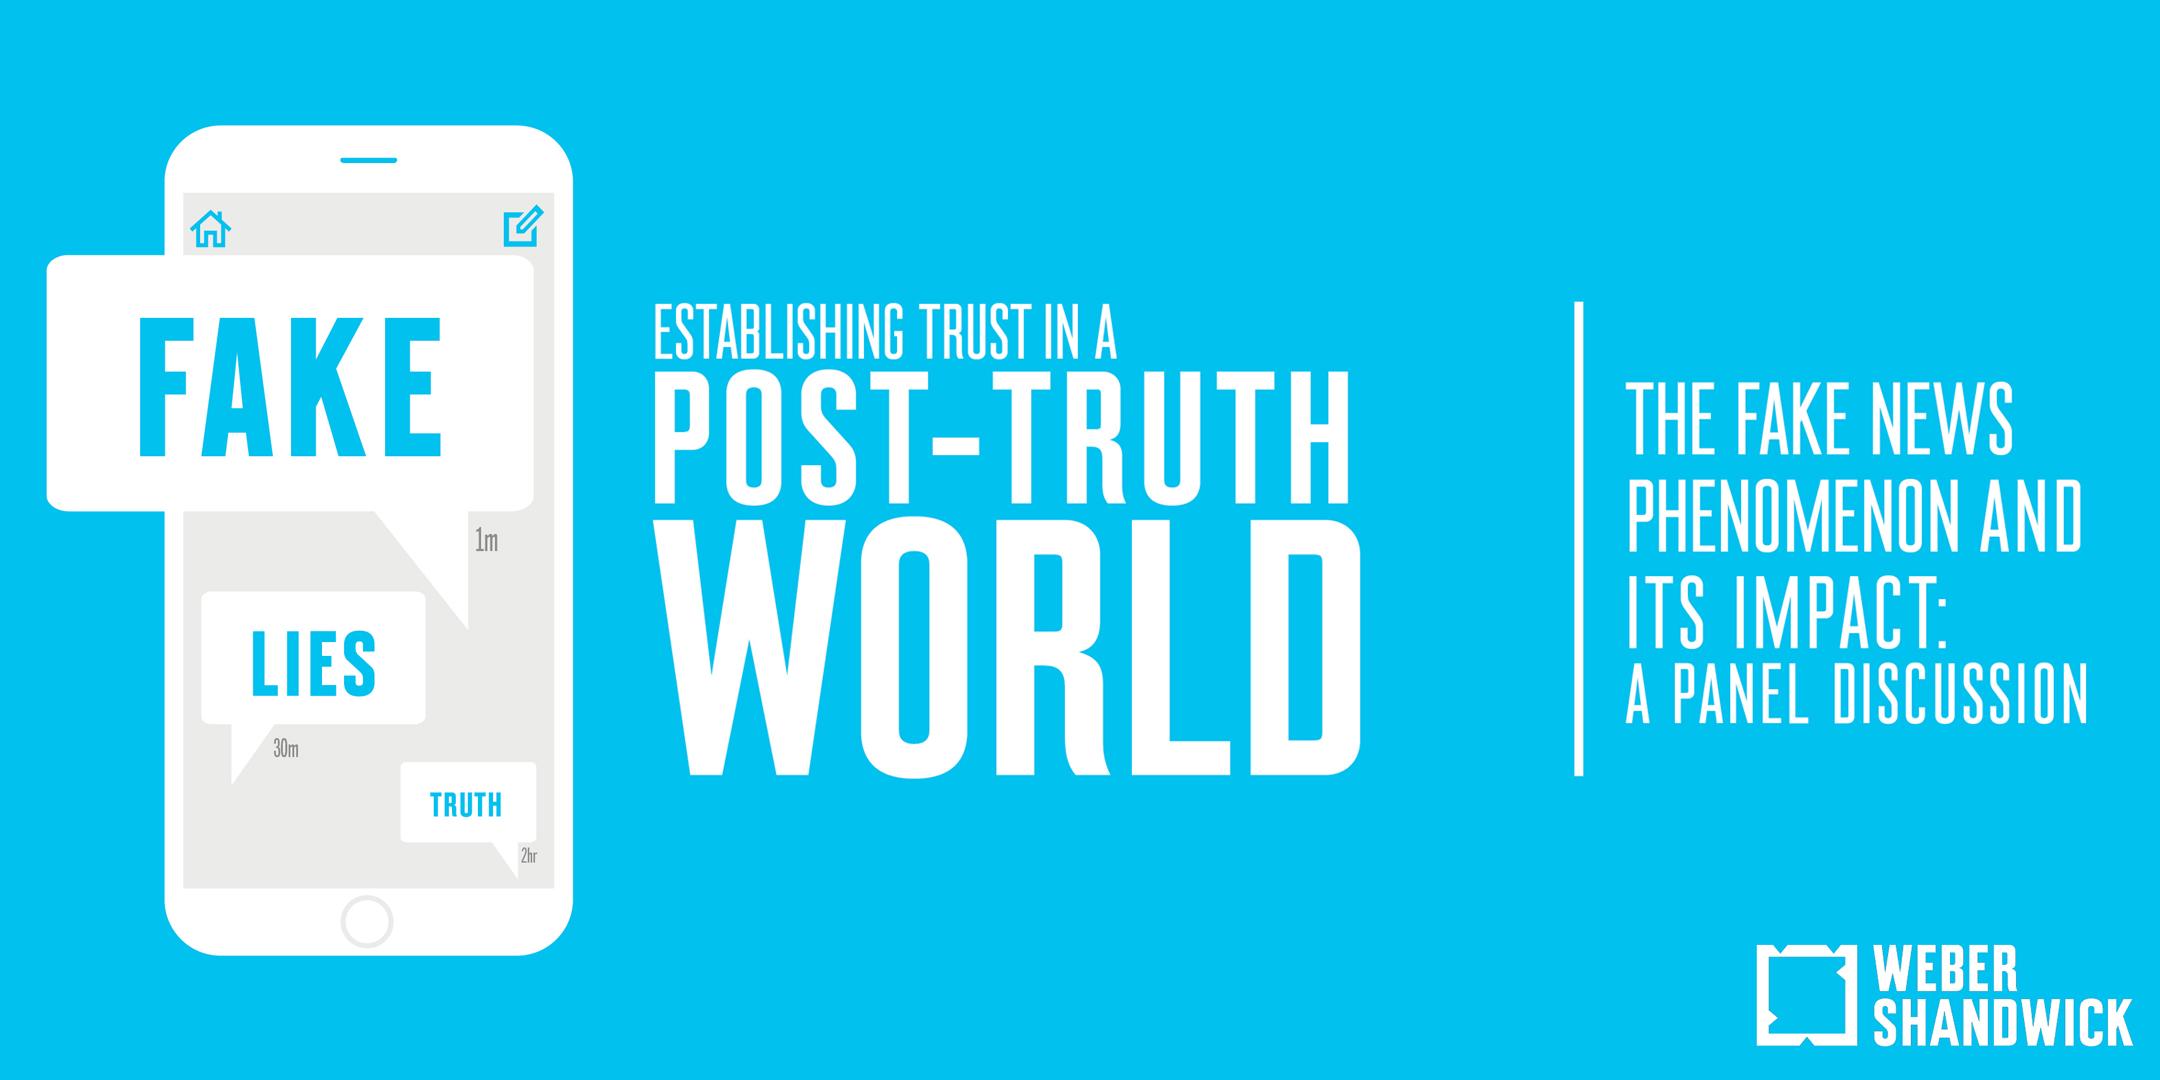 Establishing Trust in a Post-Truth World